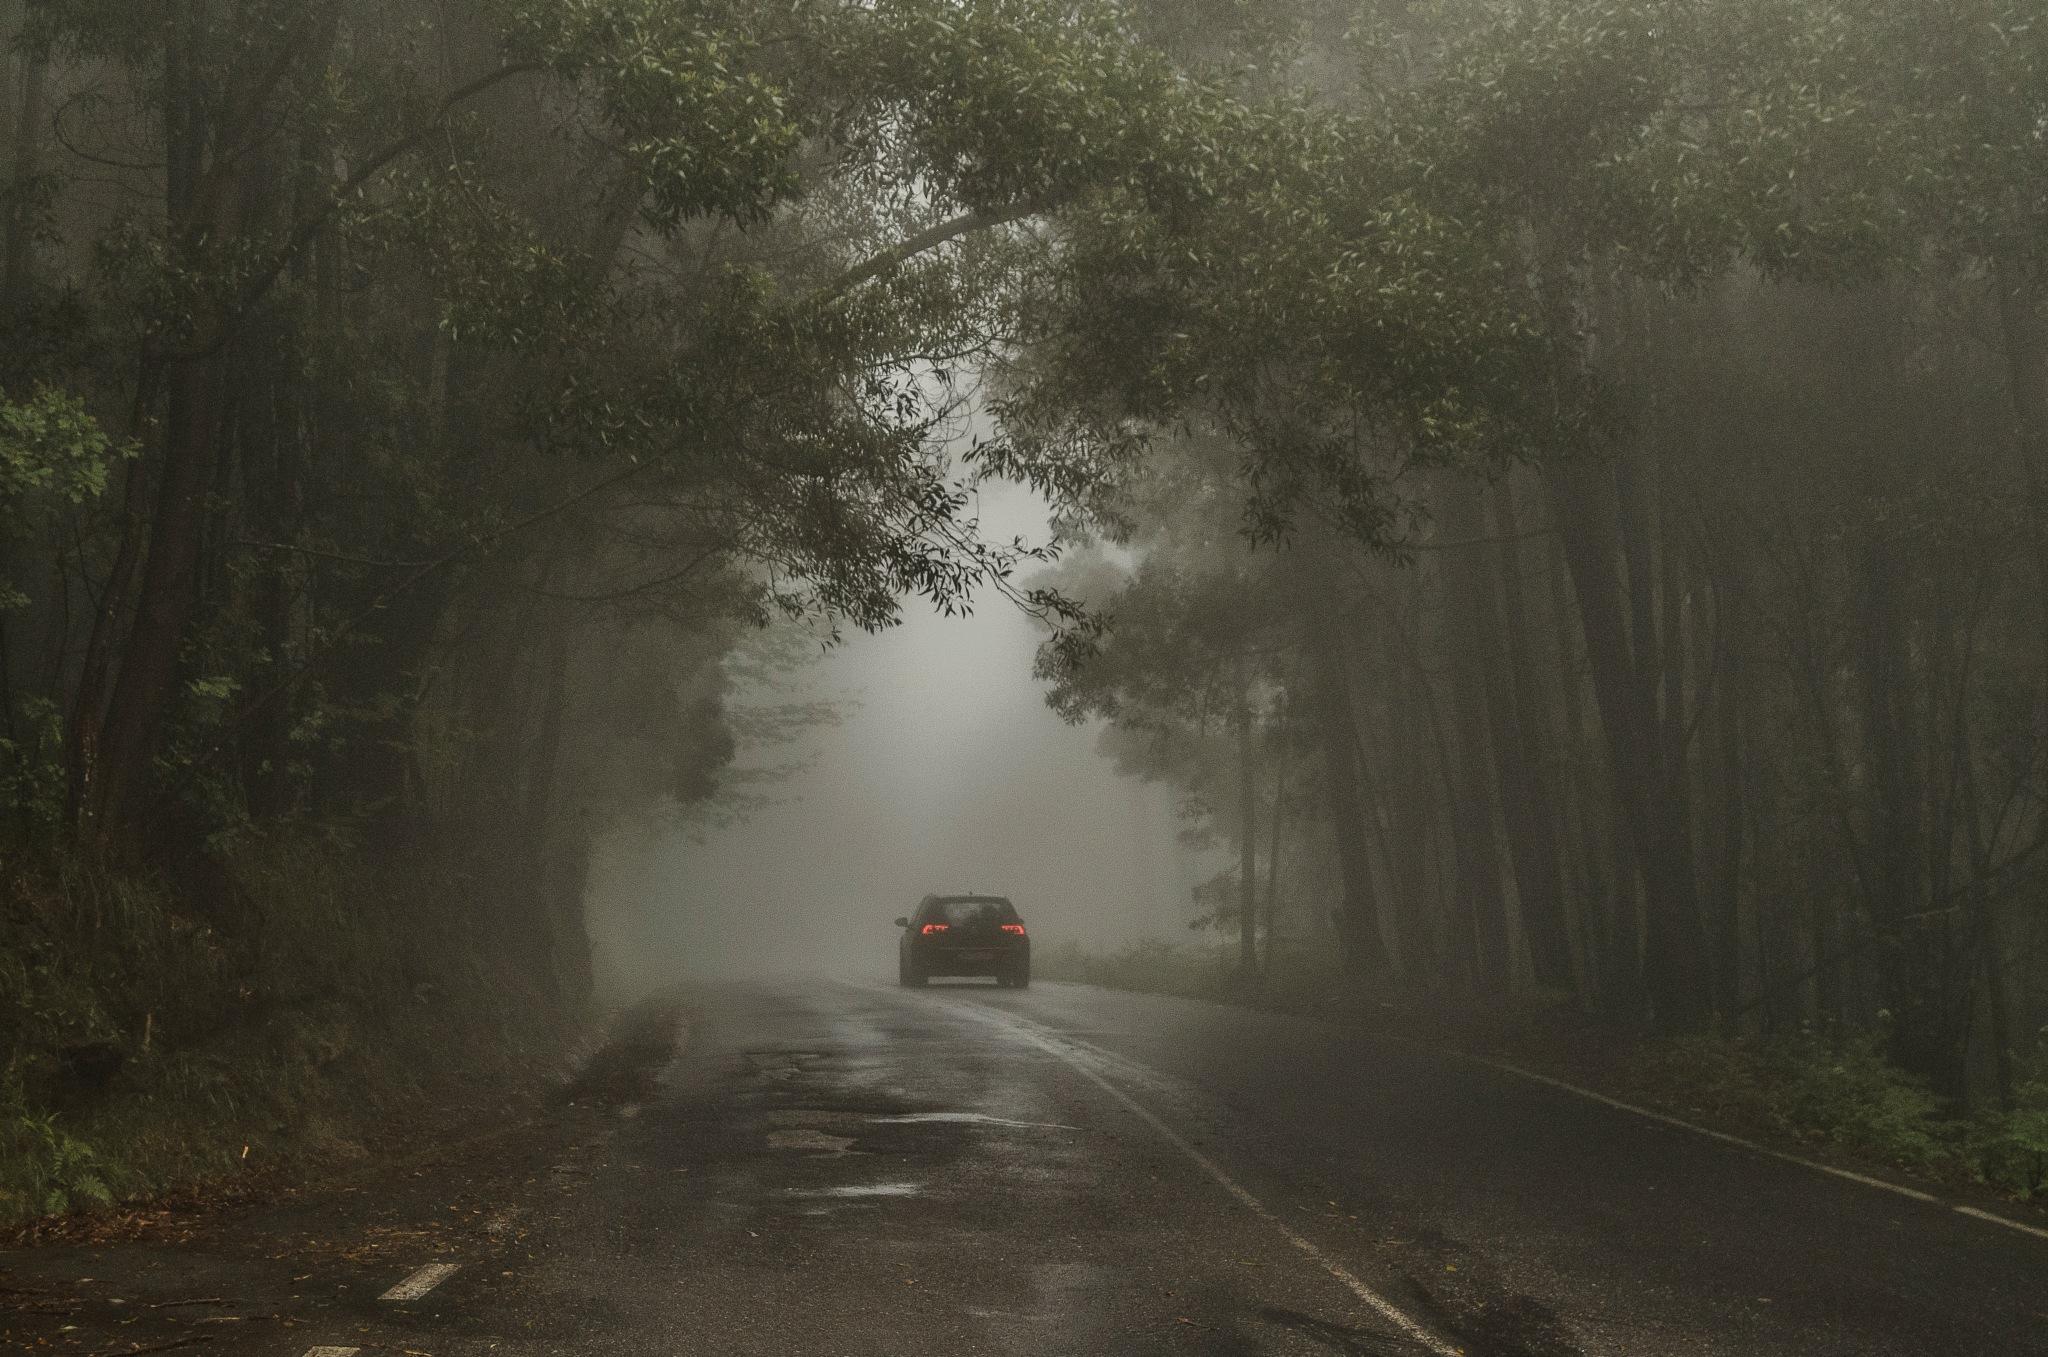 mystic road by Viren Khatri